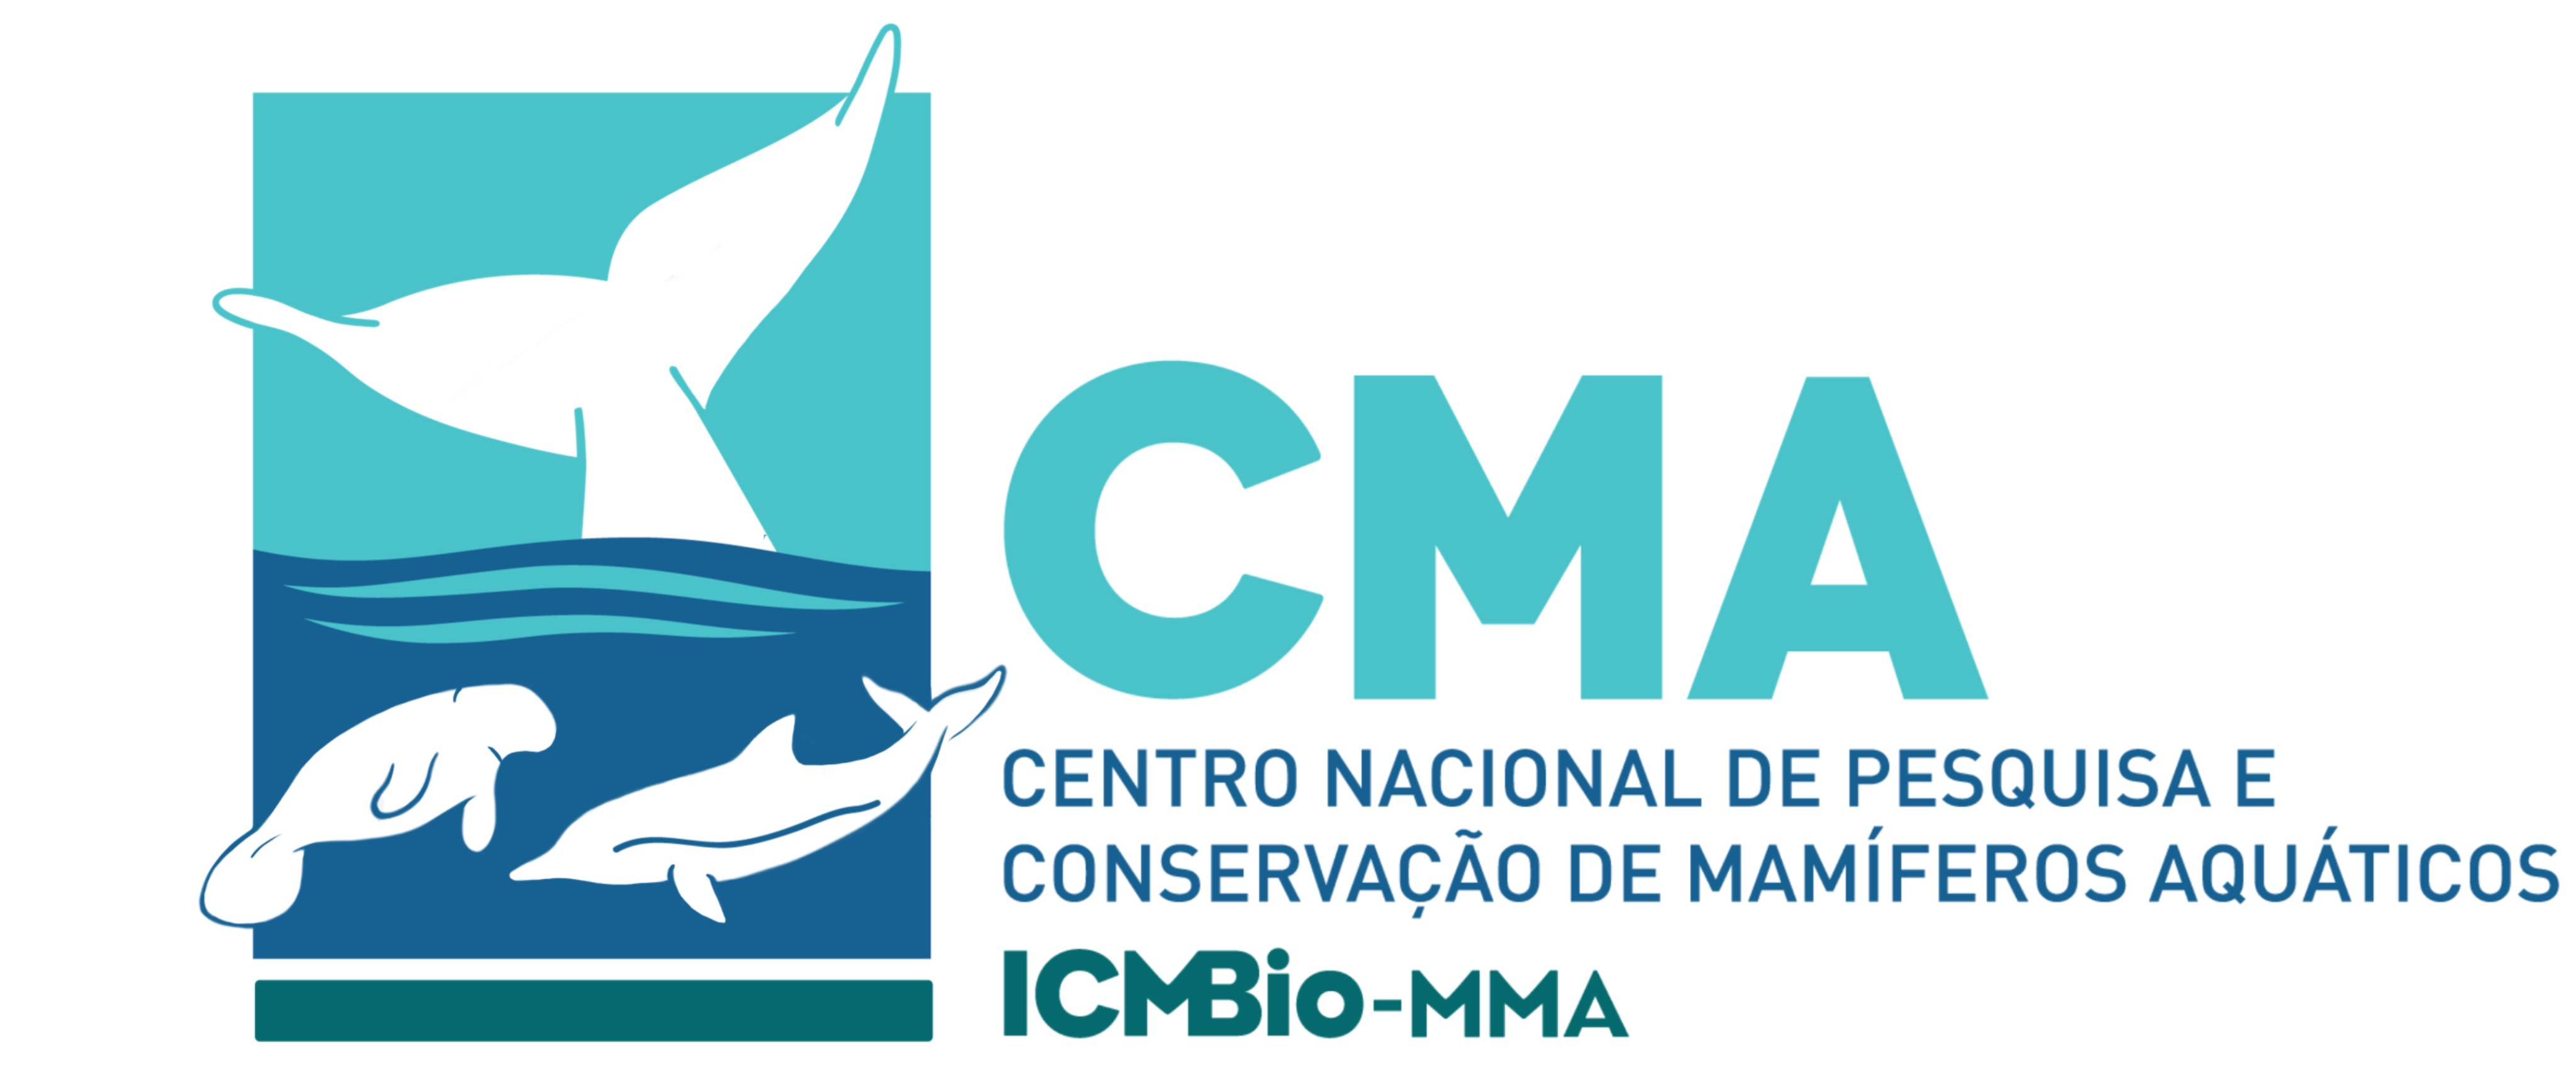 ICMBIo CMA